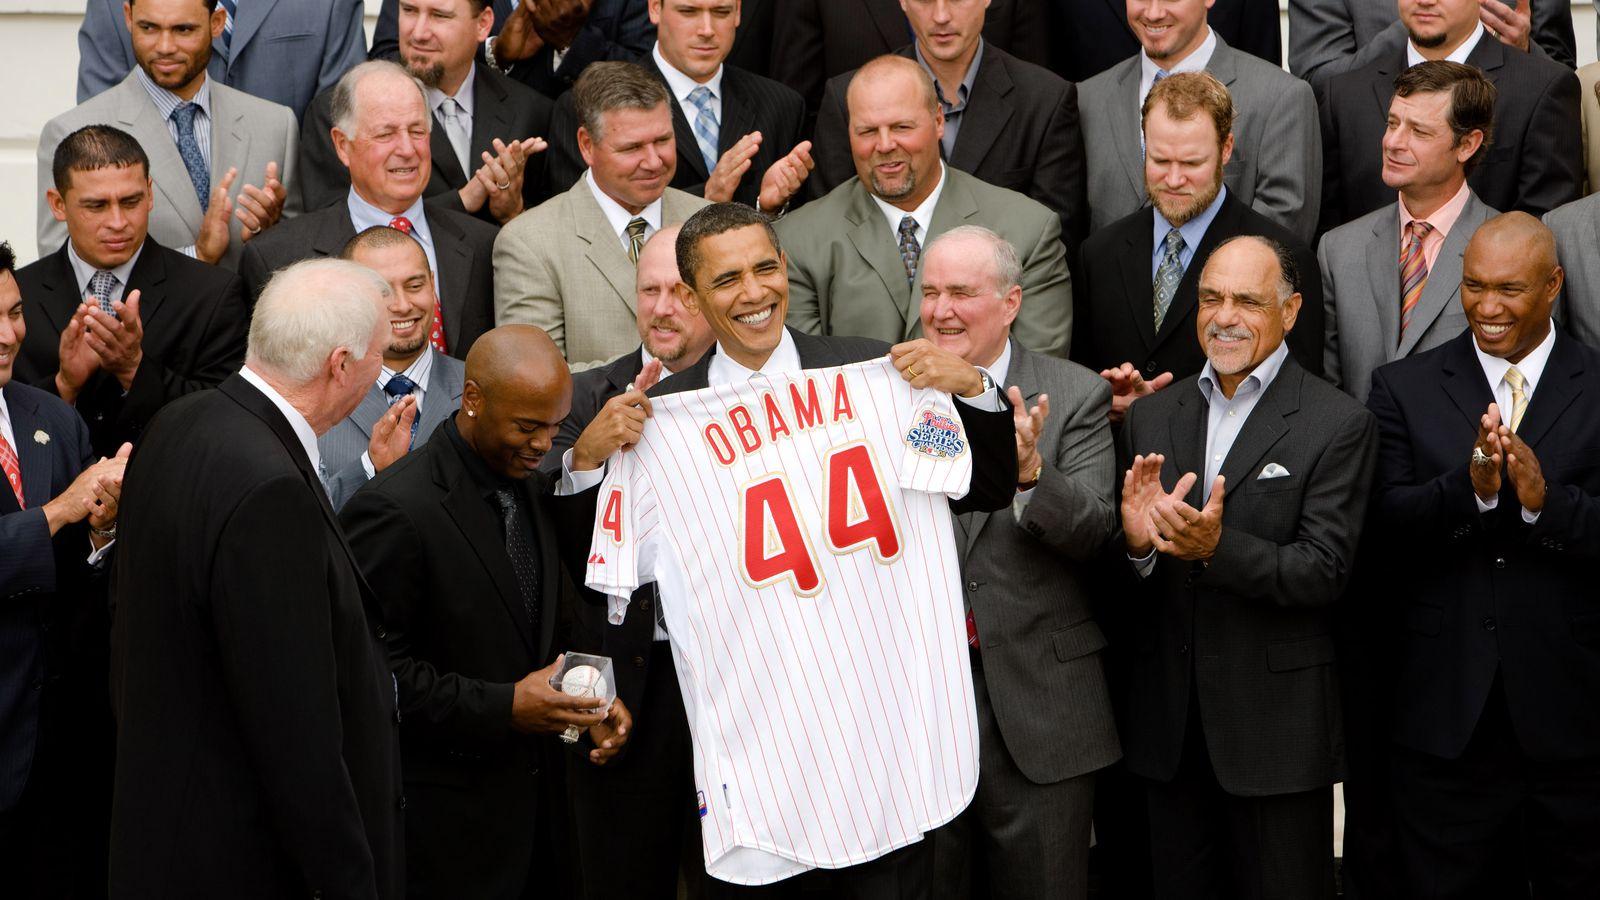 Obama_phillies.0